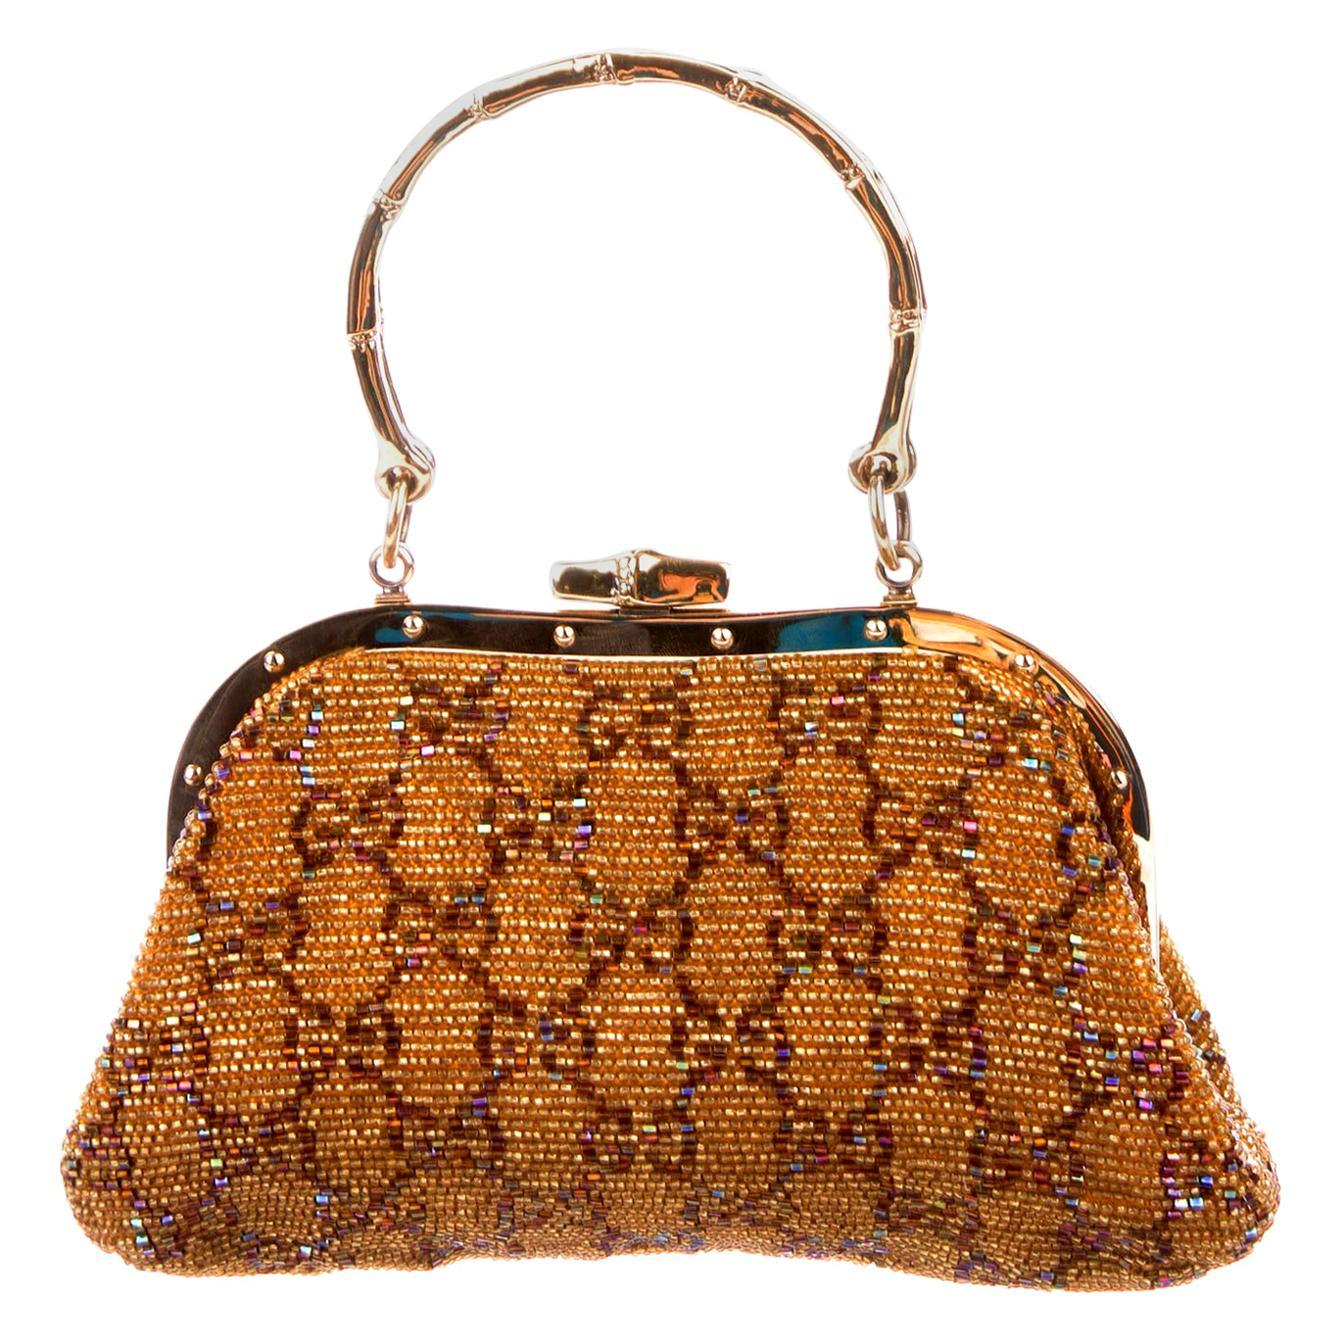 Gorgeous Golden Metallic Gucci GG Monogram Beaded Bag Purse Bamboo Handles